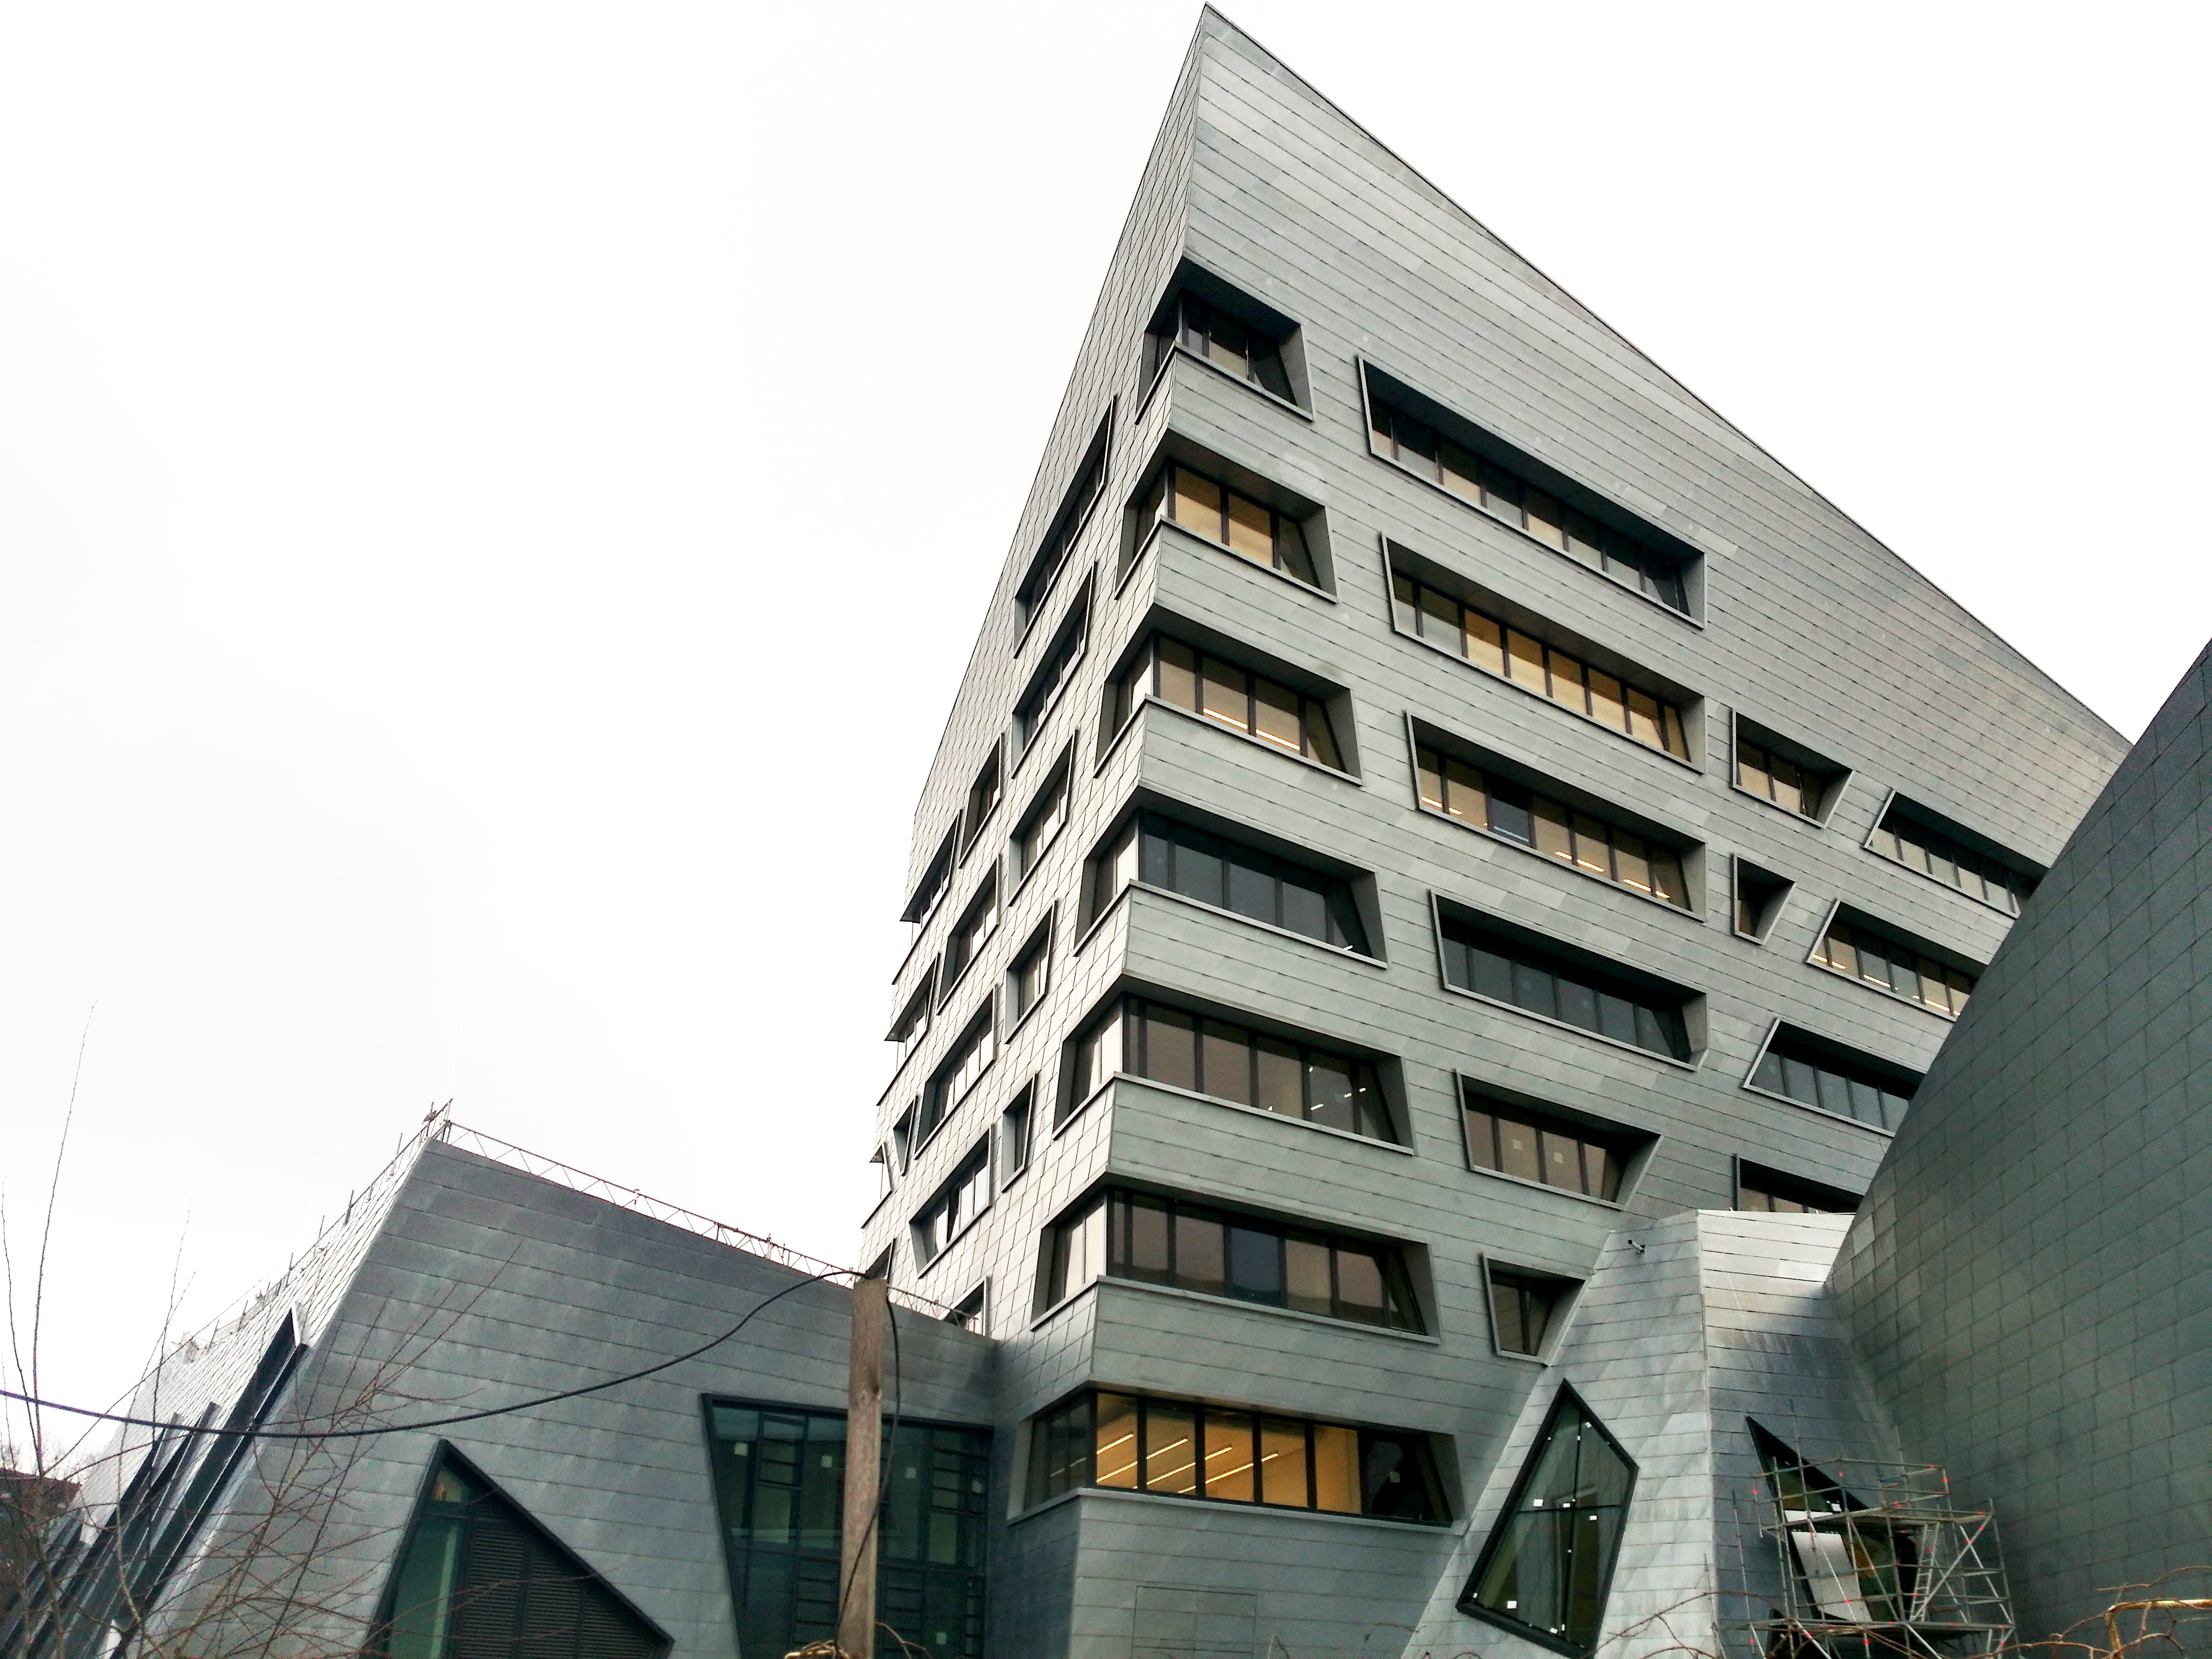 Leuphana Universität Lüneburg – Wikipedia